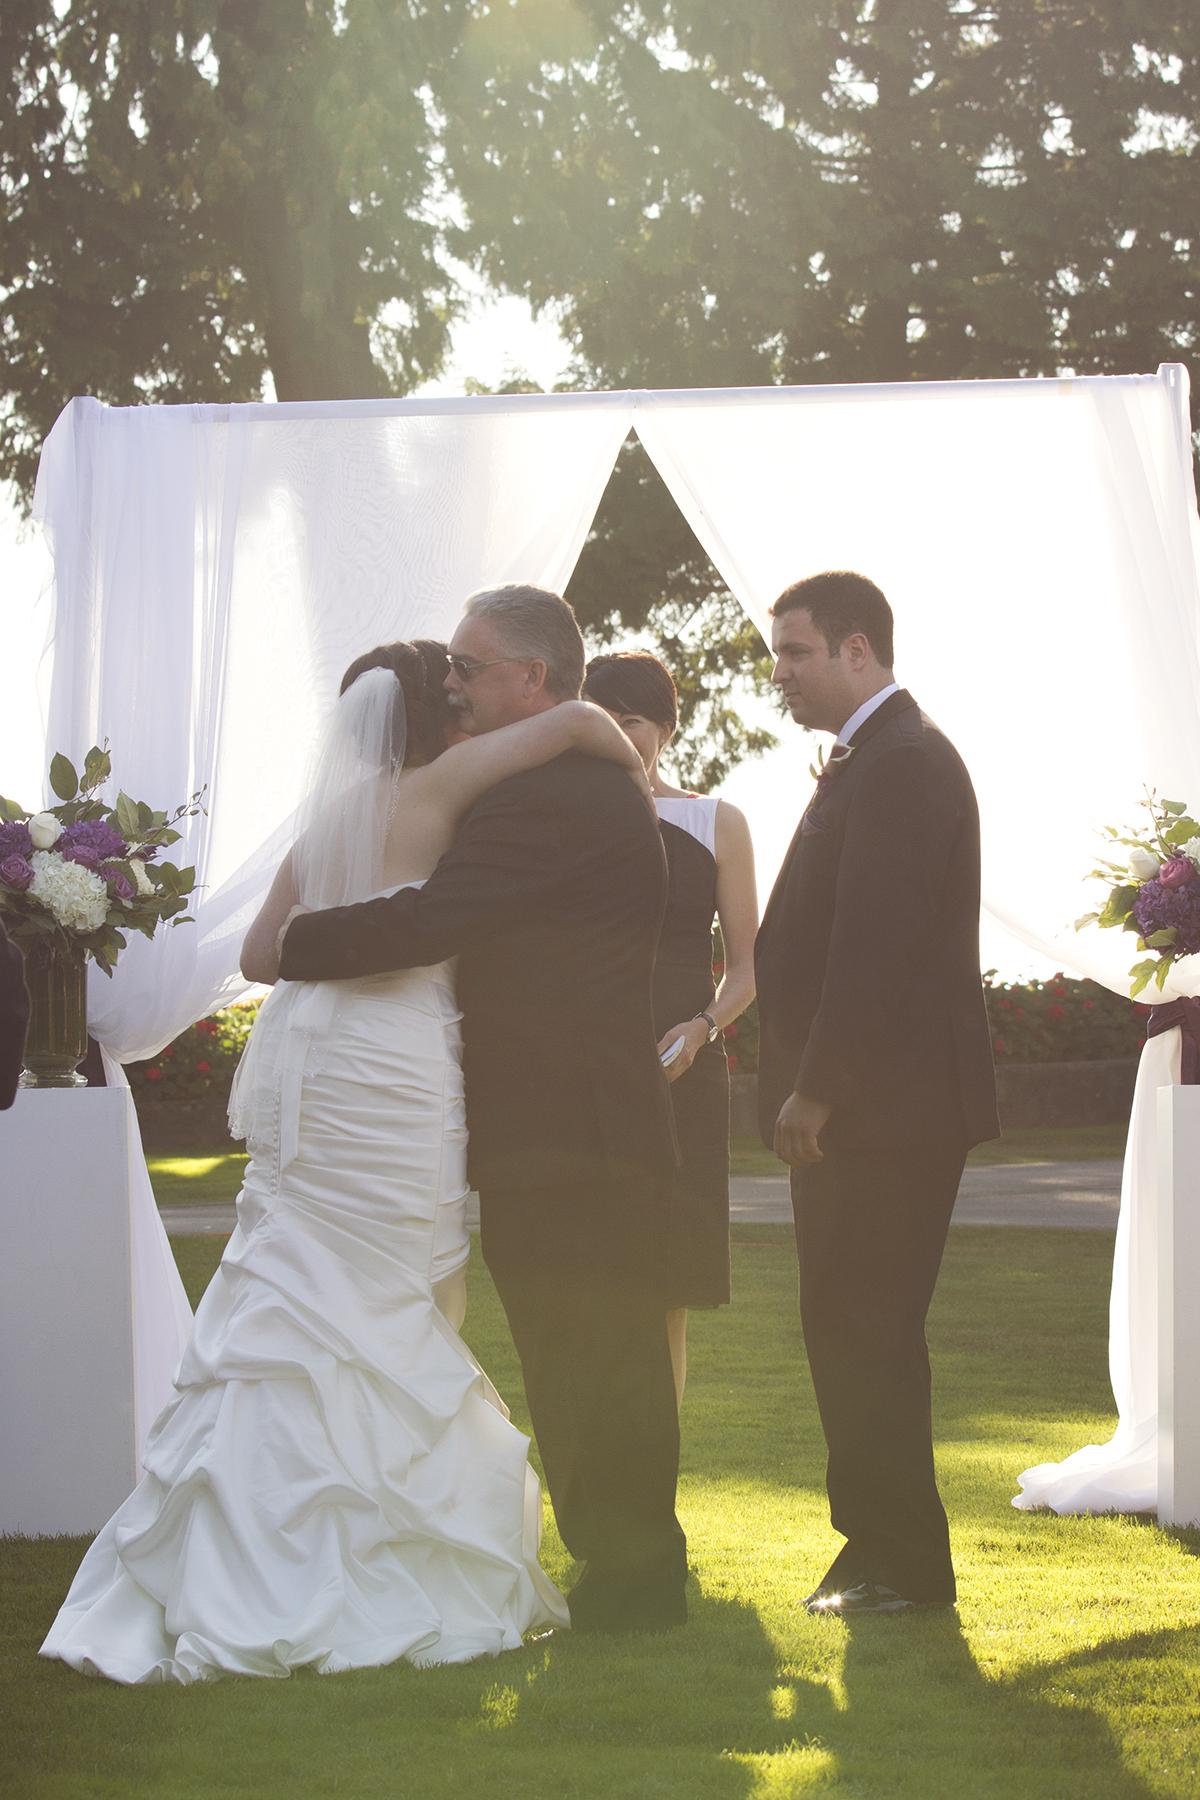 08_Jon_Leeann_wedding249.jpg